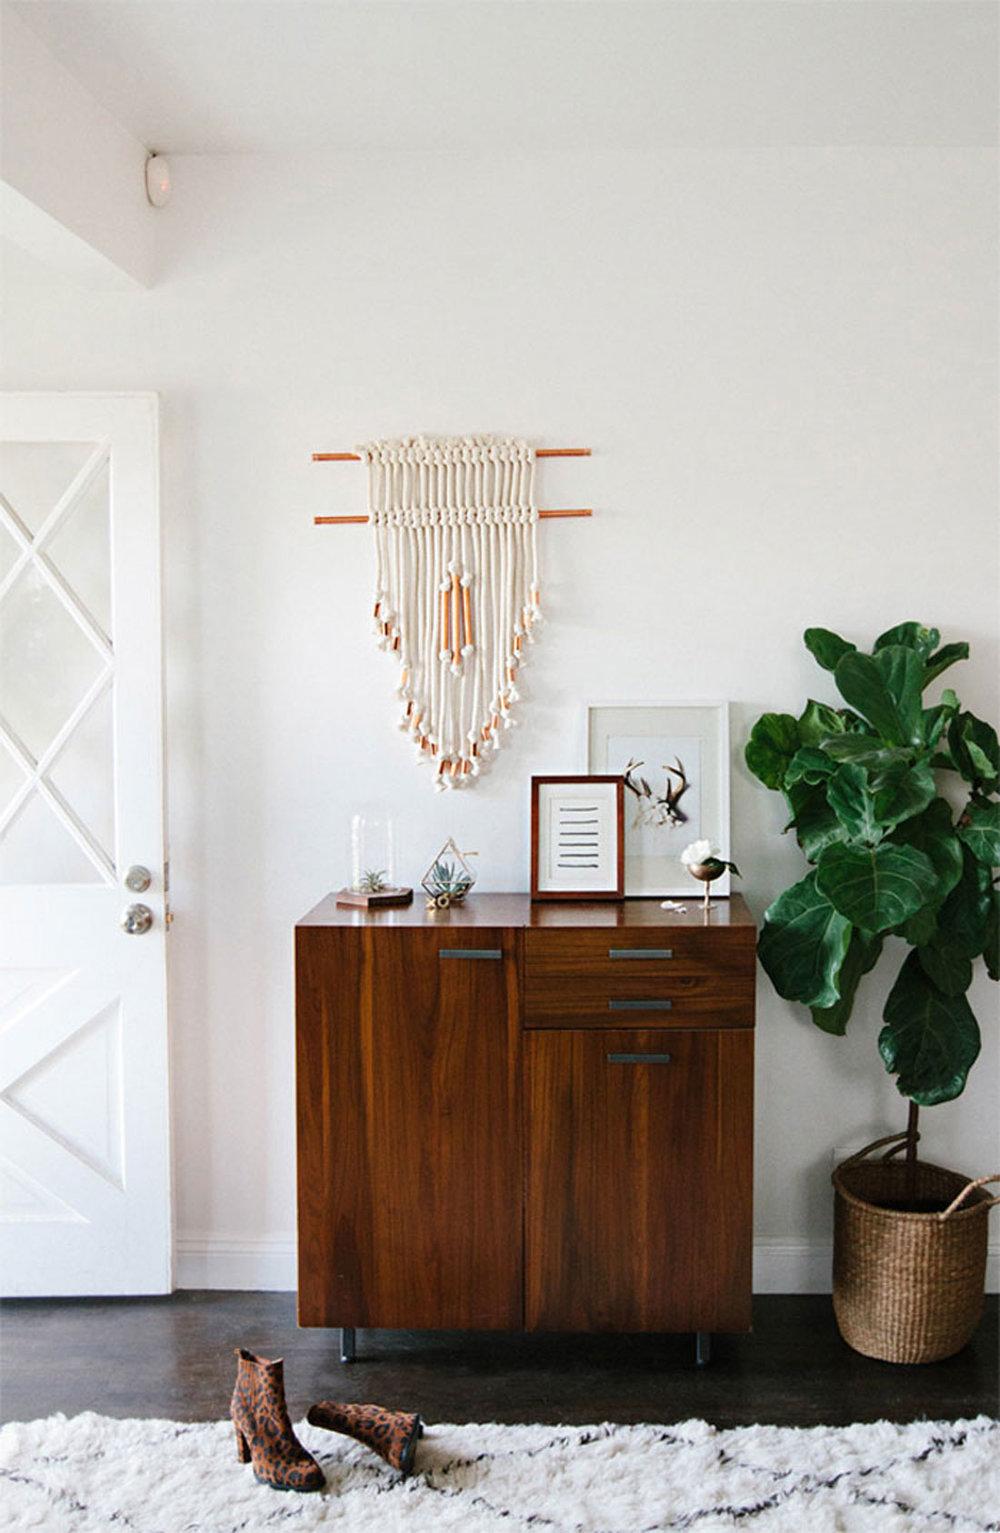 Entryway-wall-hanging-DIY6-smittenstudiosm1-1.jpg